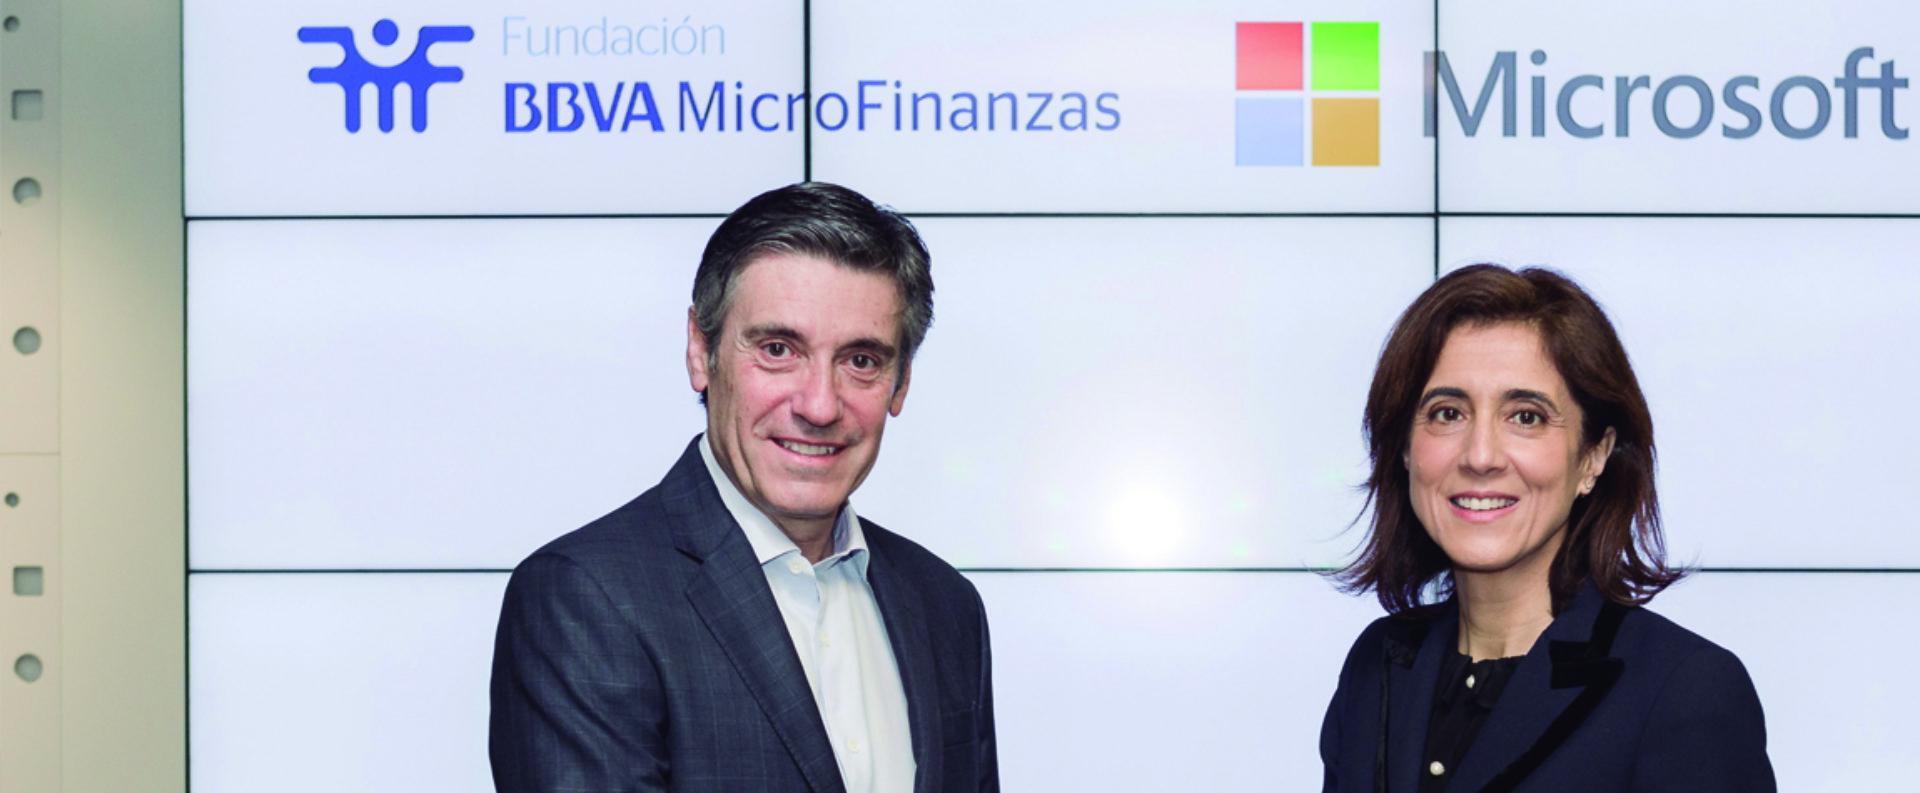 BBVA y Microsoft